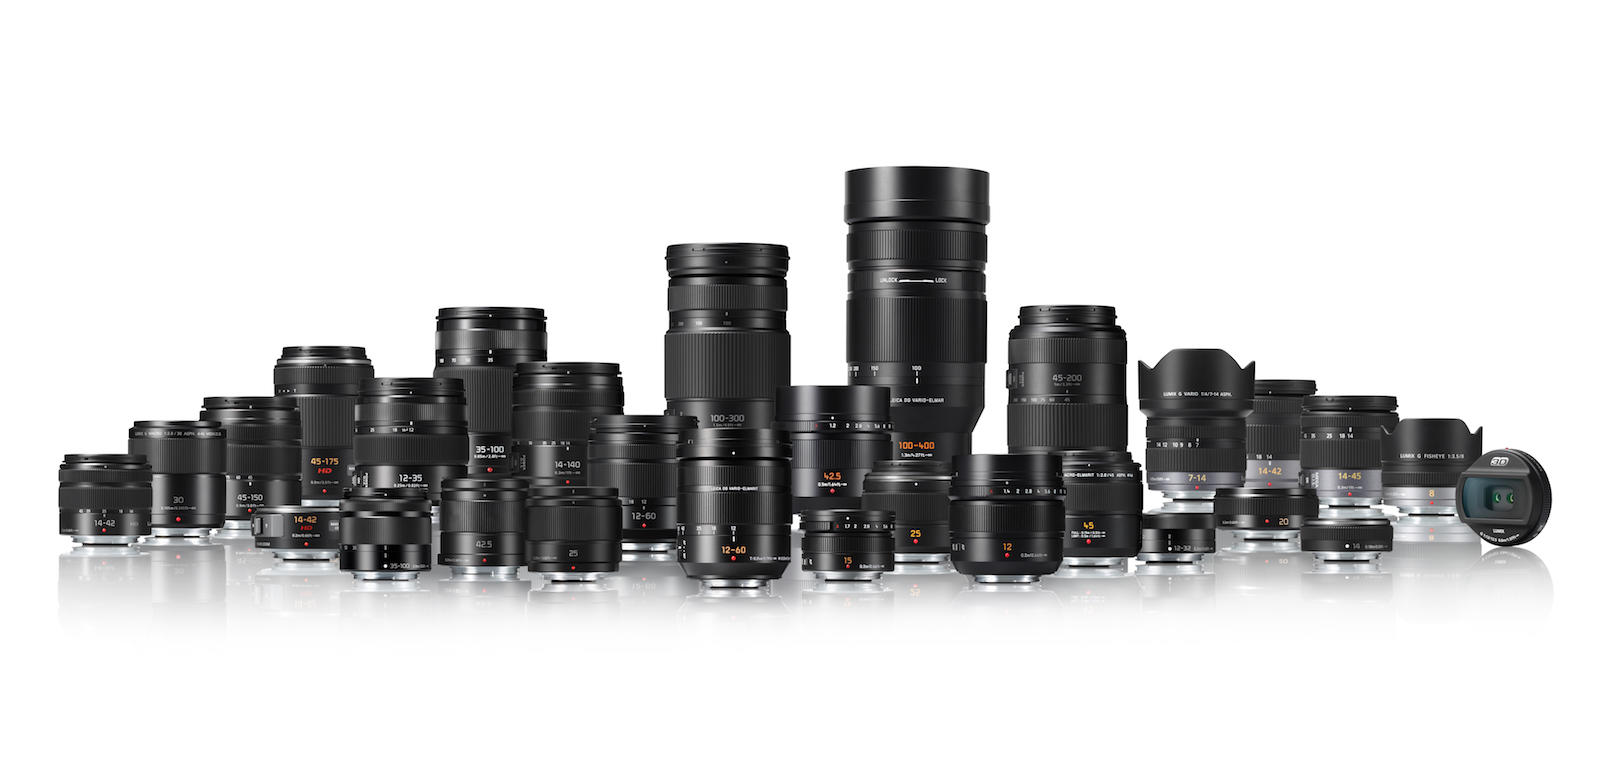 http://thedigitalstory.com/2017/01/05/Panasonic-lens-lineup-web.jpg